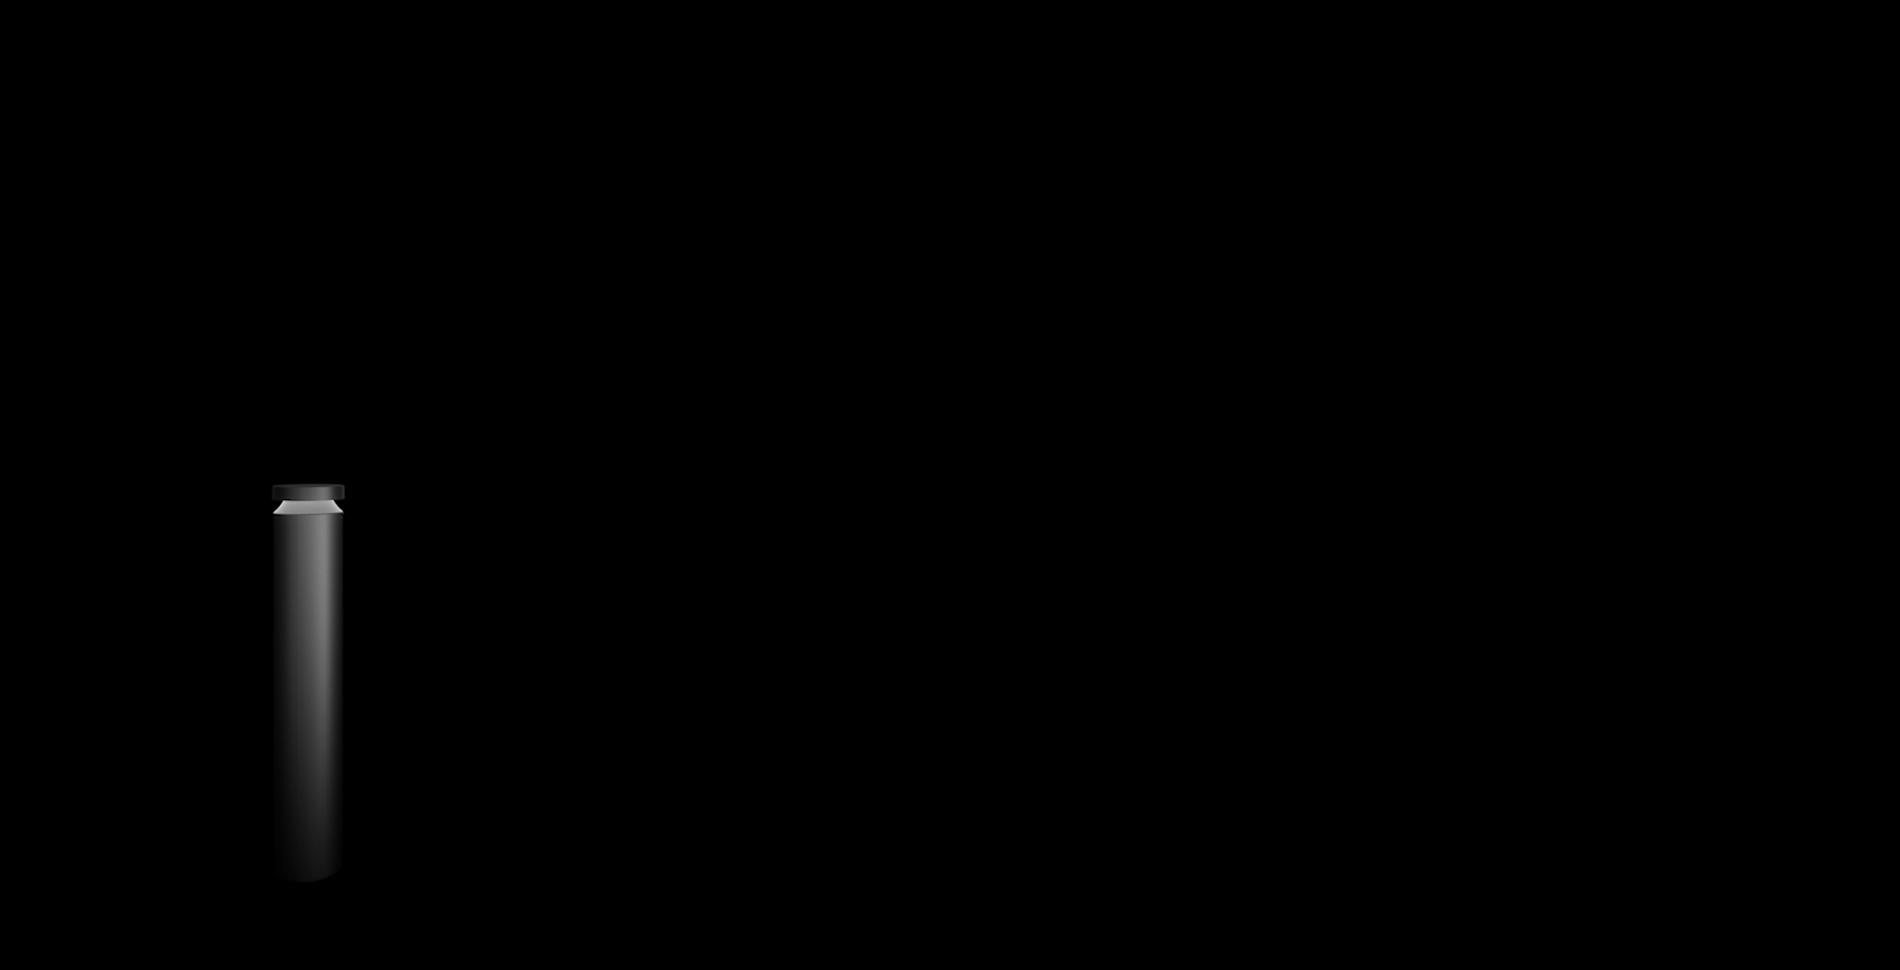 Sequenza-0227